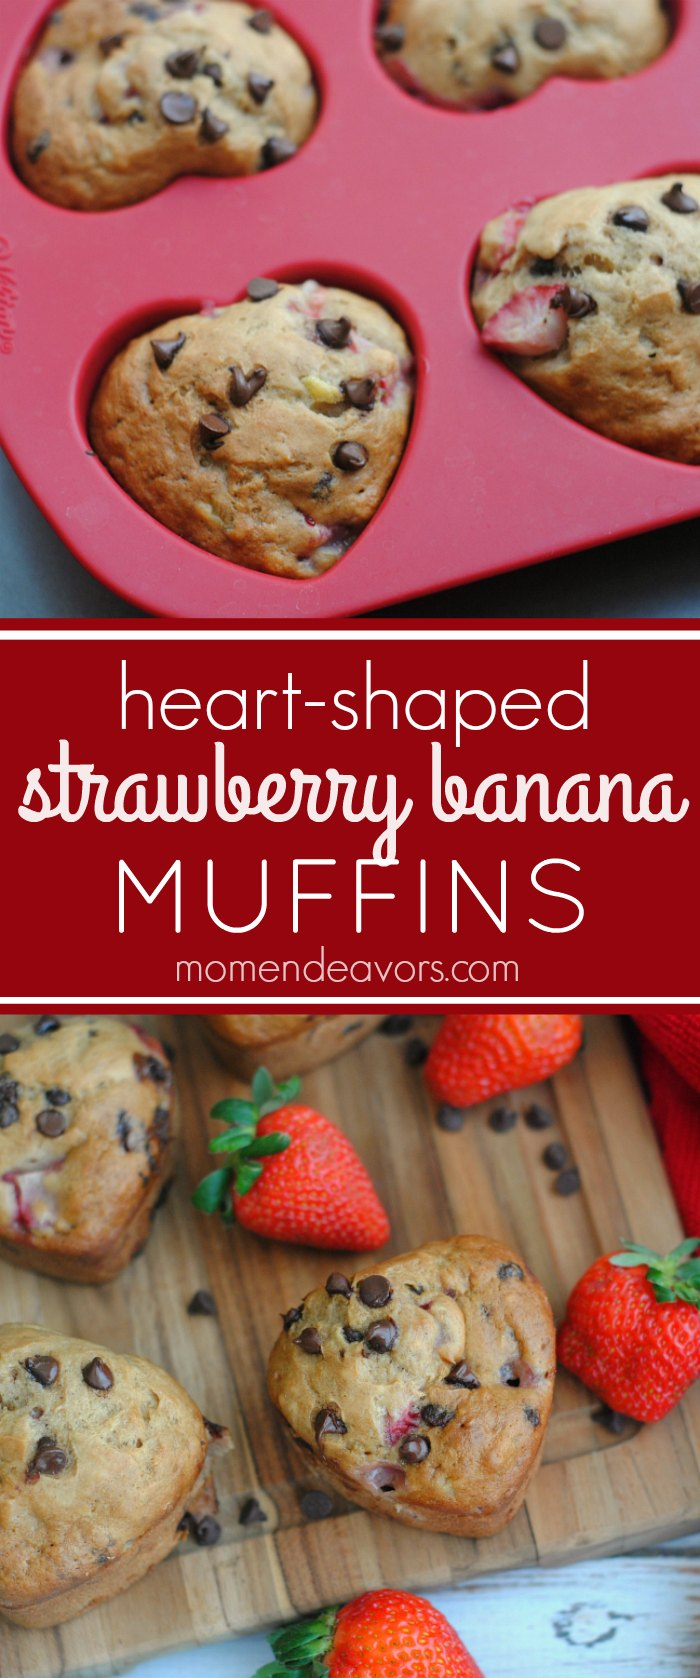 Heart-Shaped Strawberry Banana Muffins